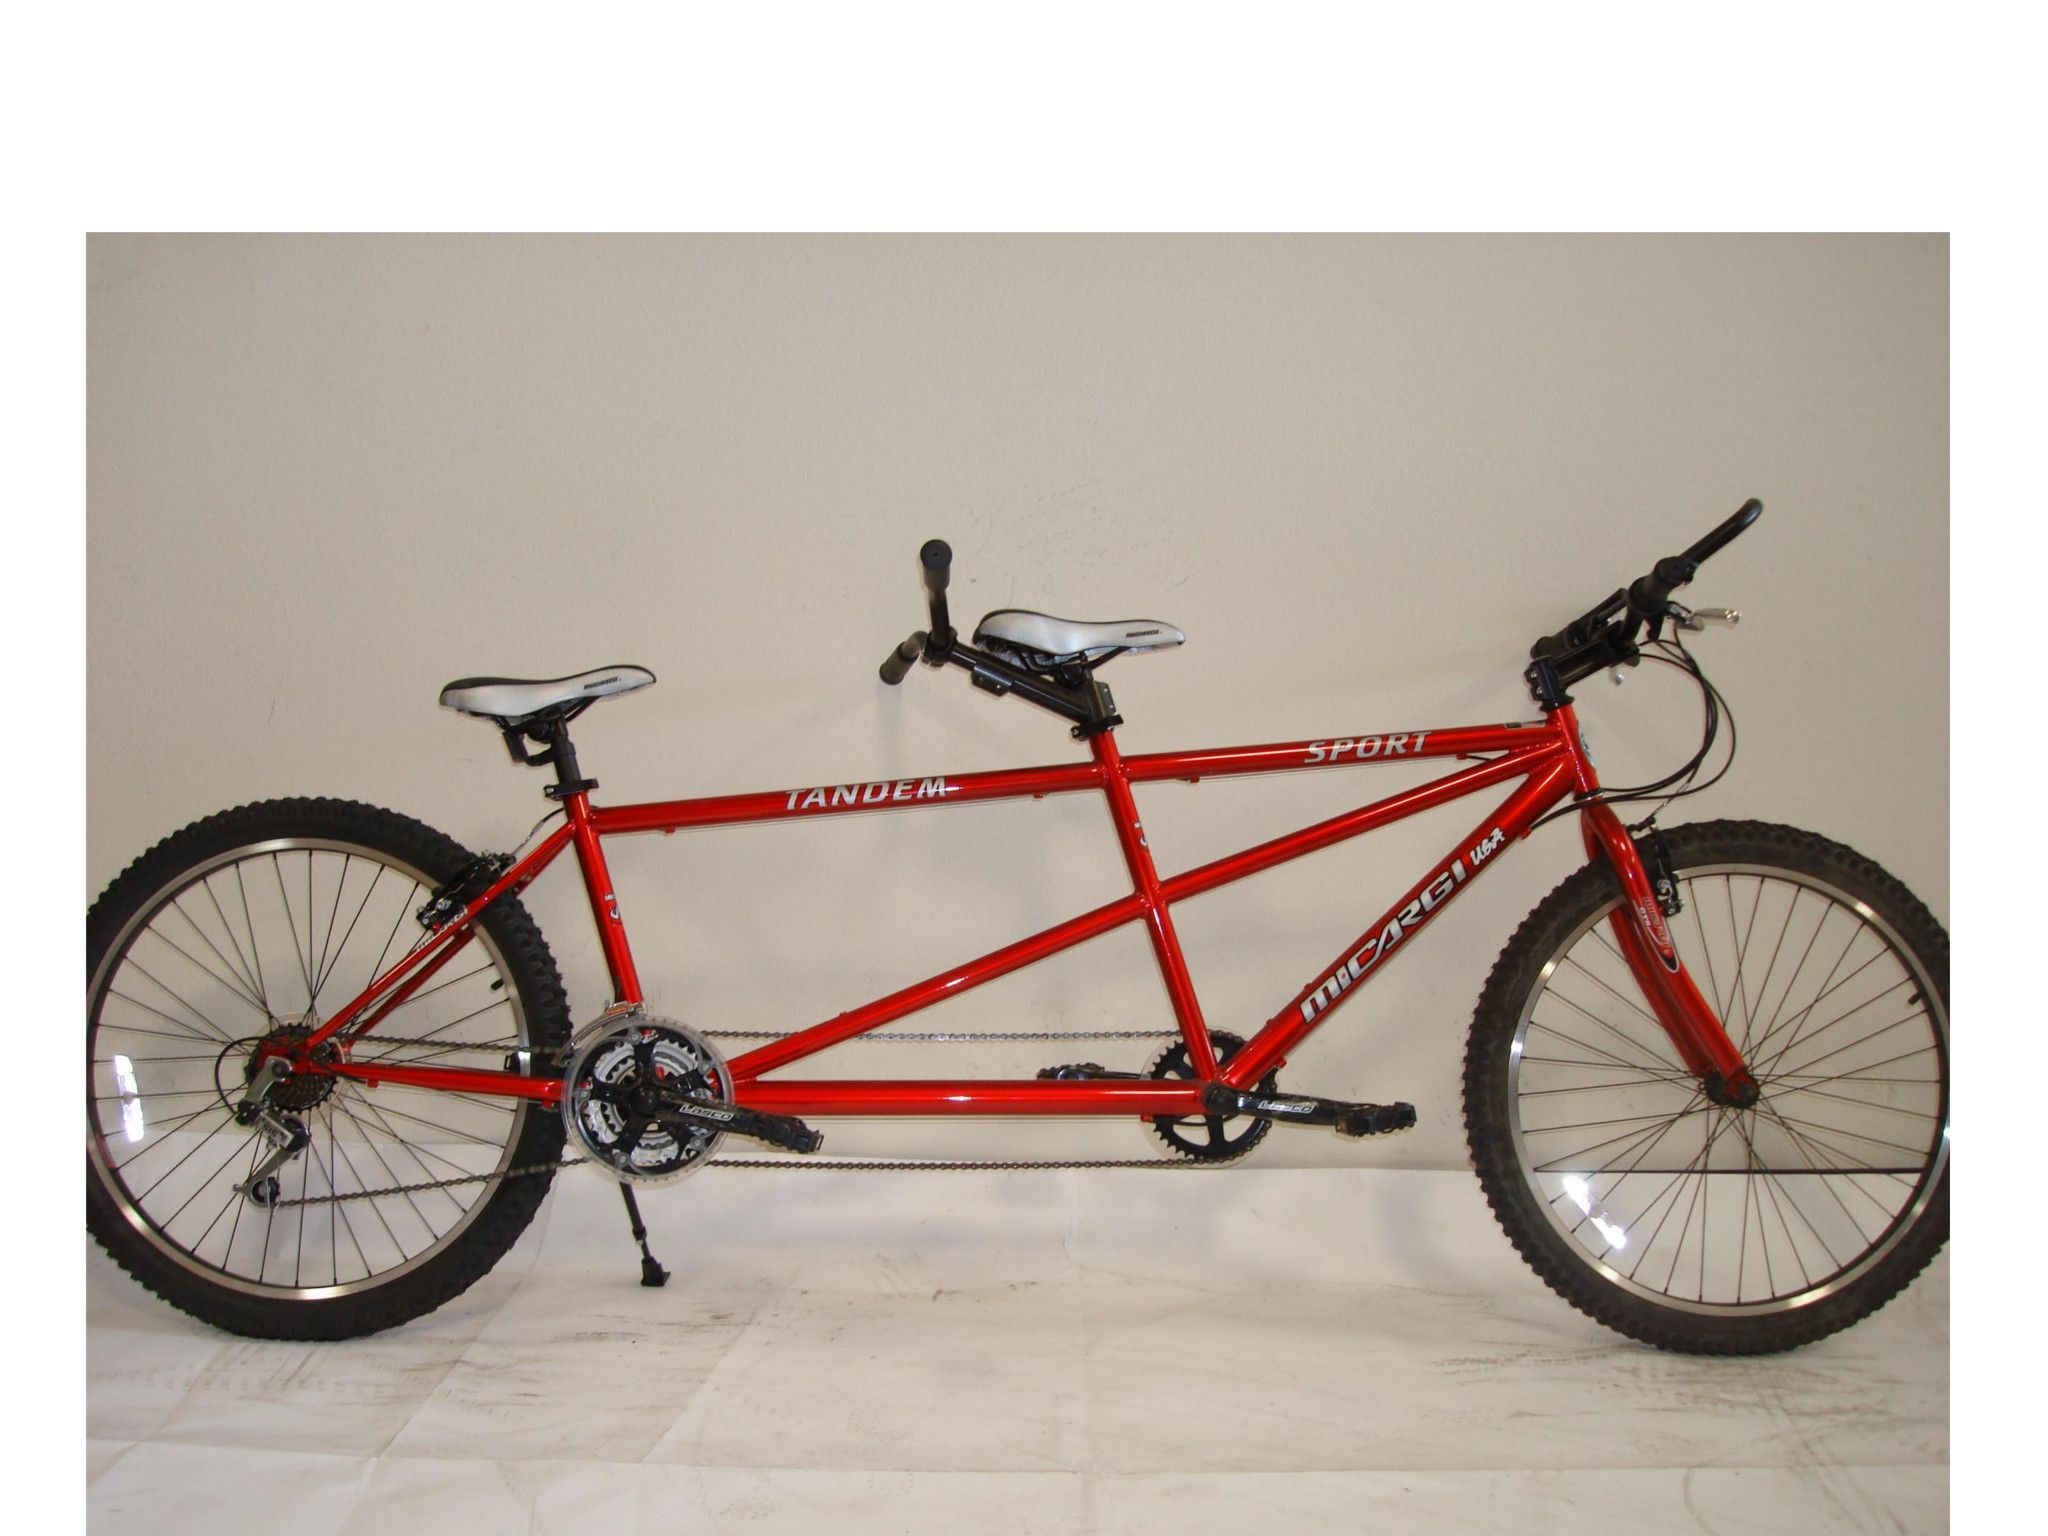 Micargi sport shimano 7 speed 26 tandem beach cruiser bike red